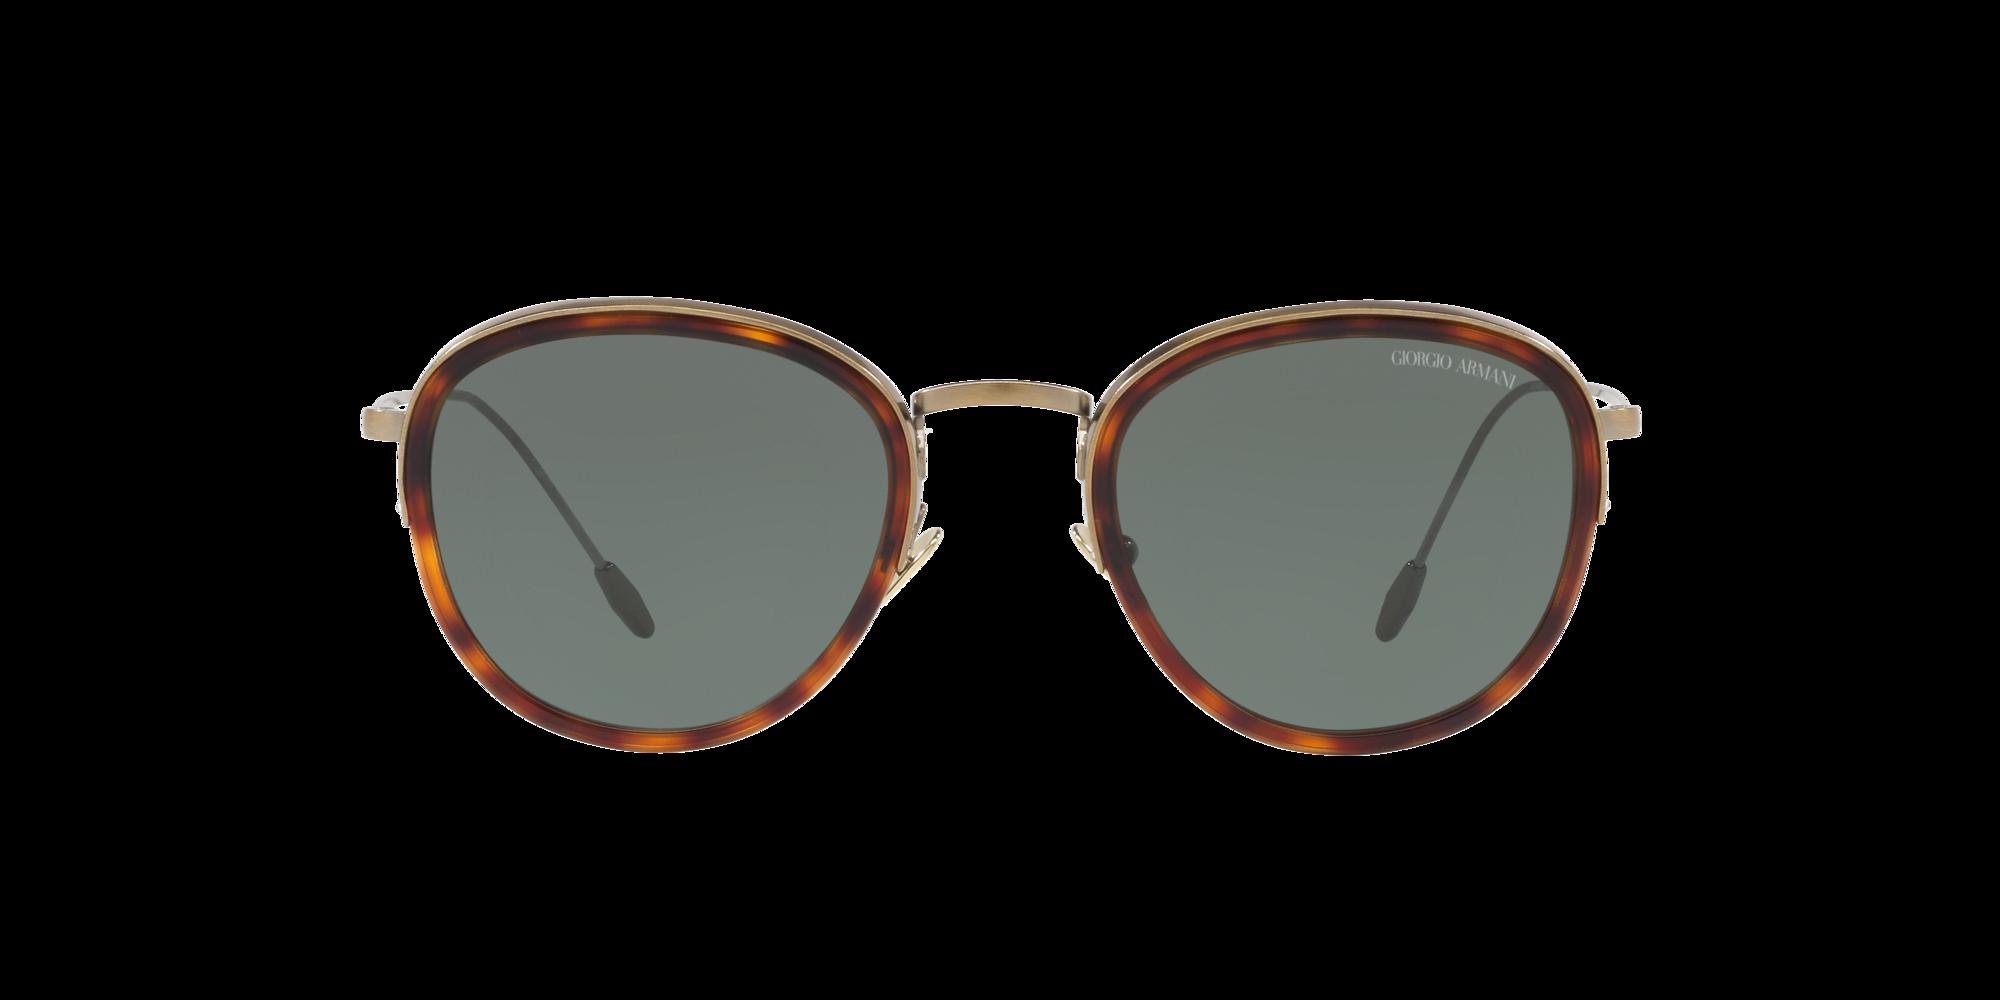 Image for AR6068 50 from LensCrafters   Glasses, Prescription Glasses Online, Eyewear